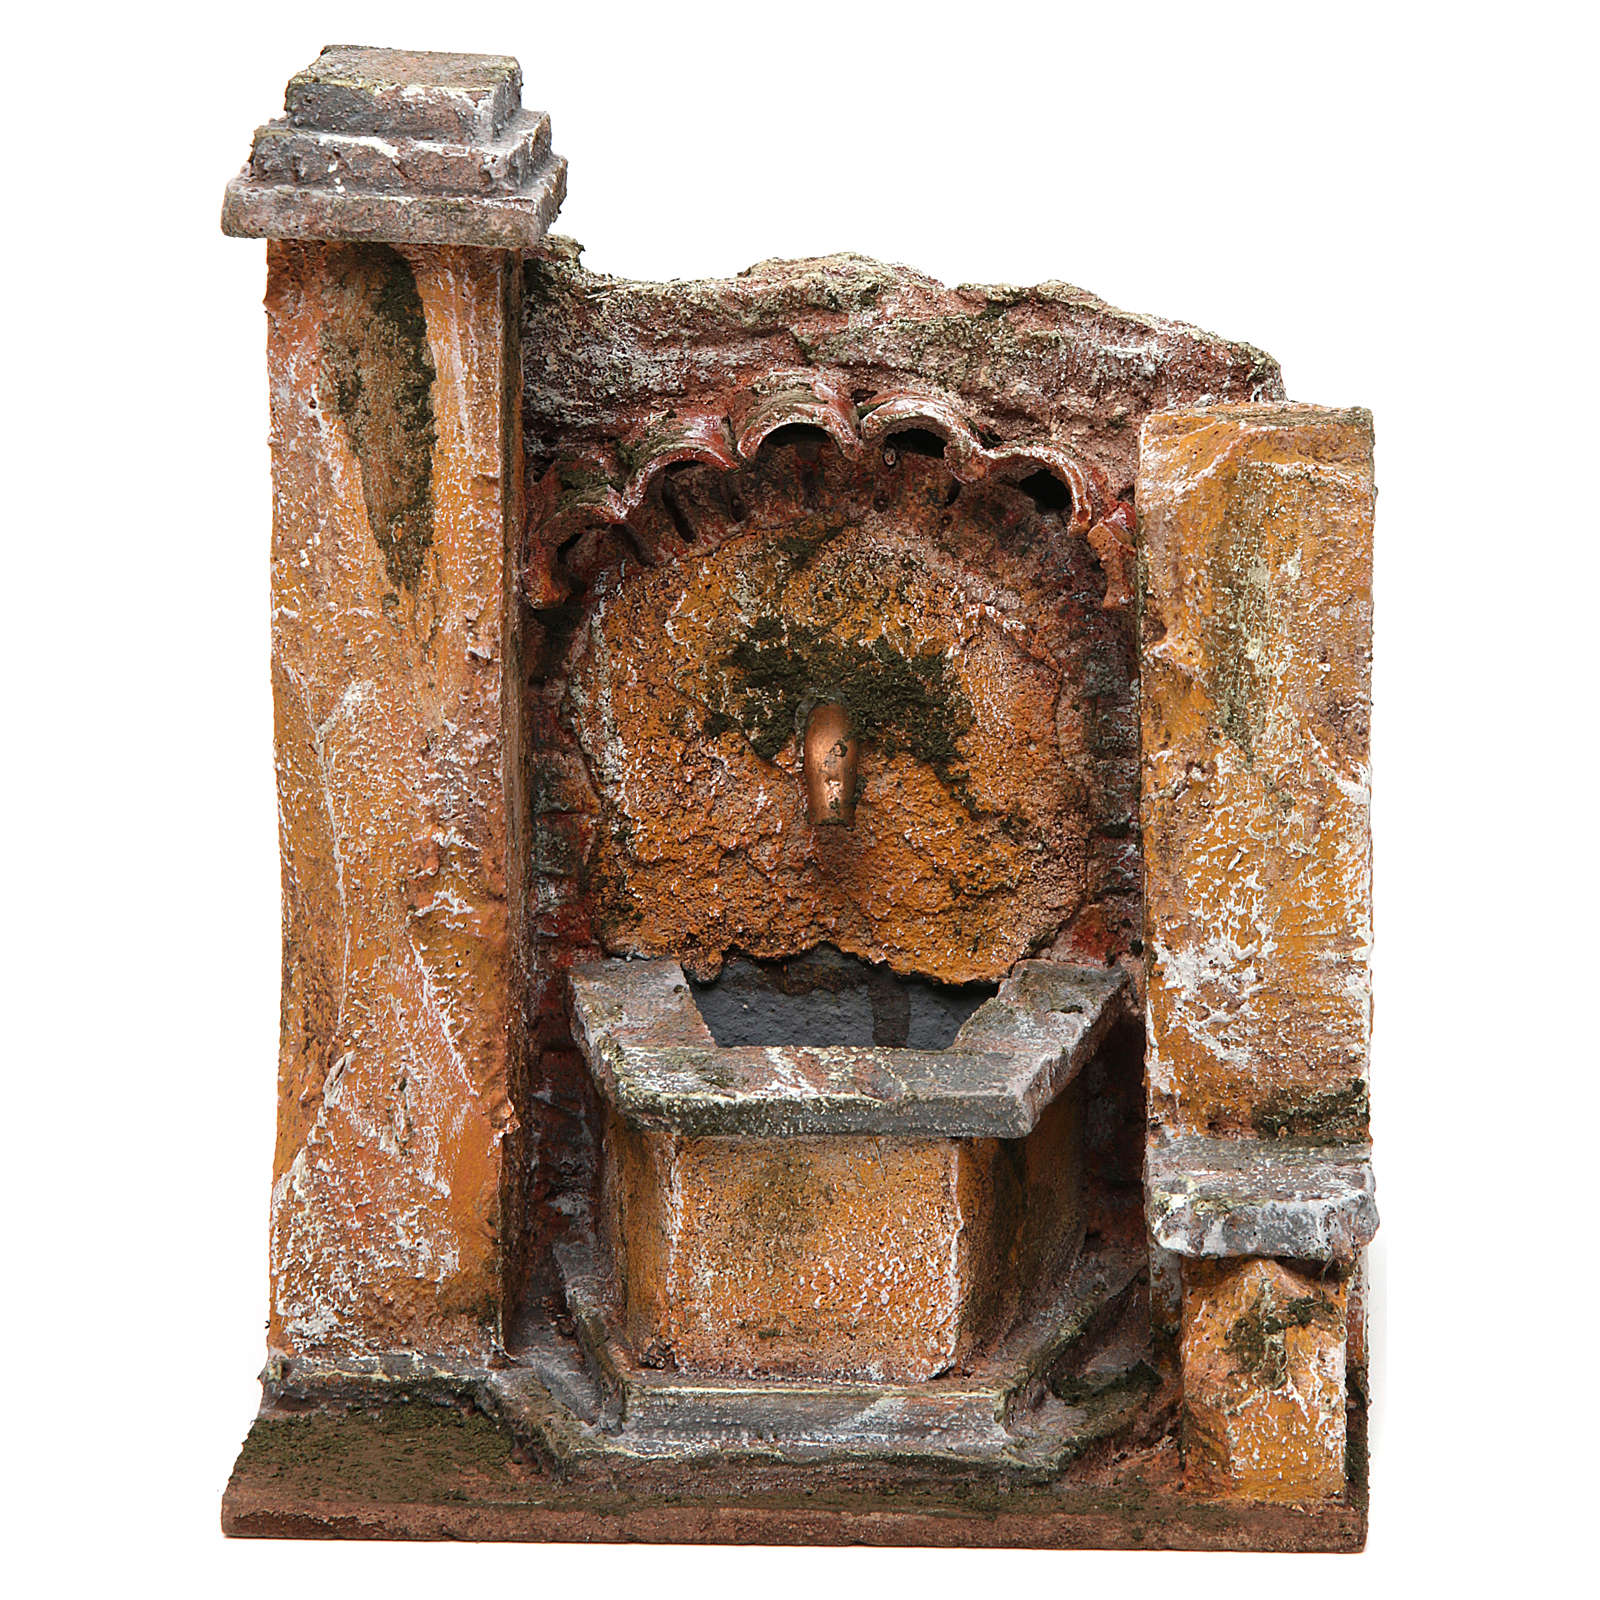 Antique Fountain for nativity 18x16x16cm 4